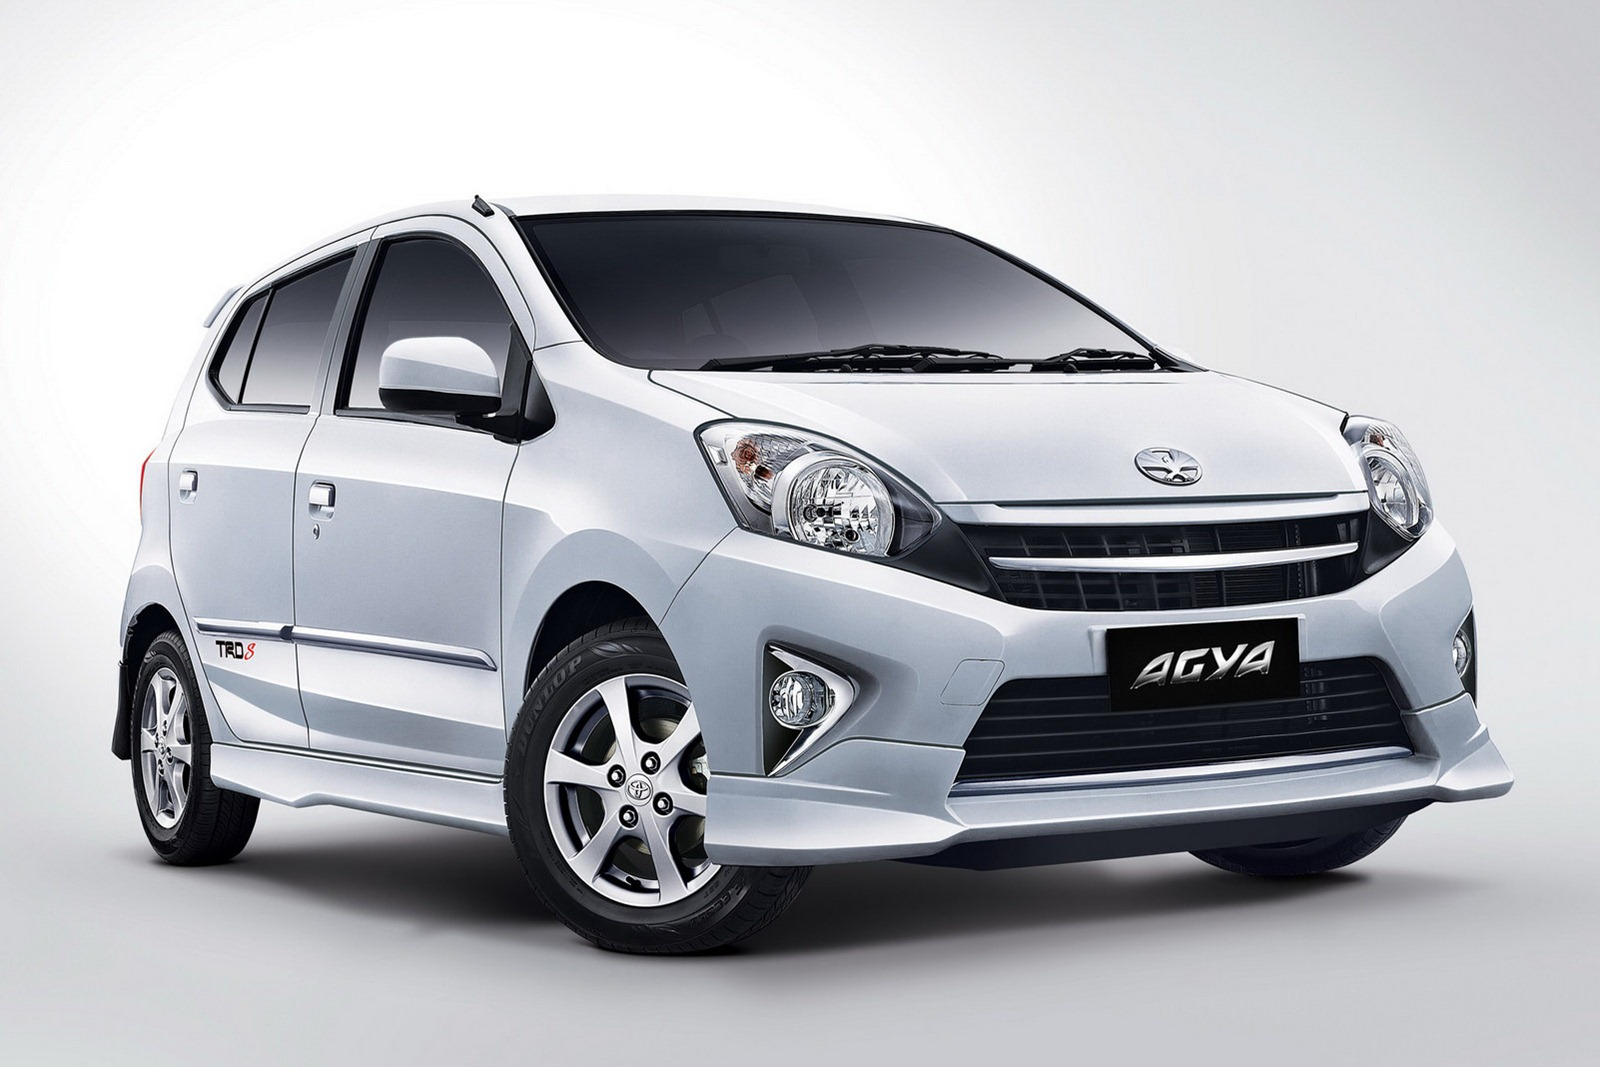 Warna New Agya Trd Head Unit Grand Veloz 1.5 Kumpulan Gambar Mobil Toyota Dan Daihatsu Ayla